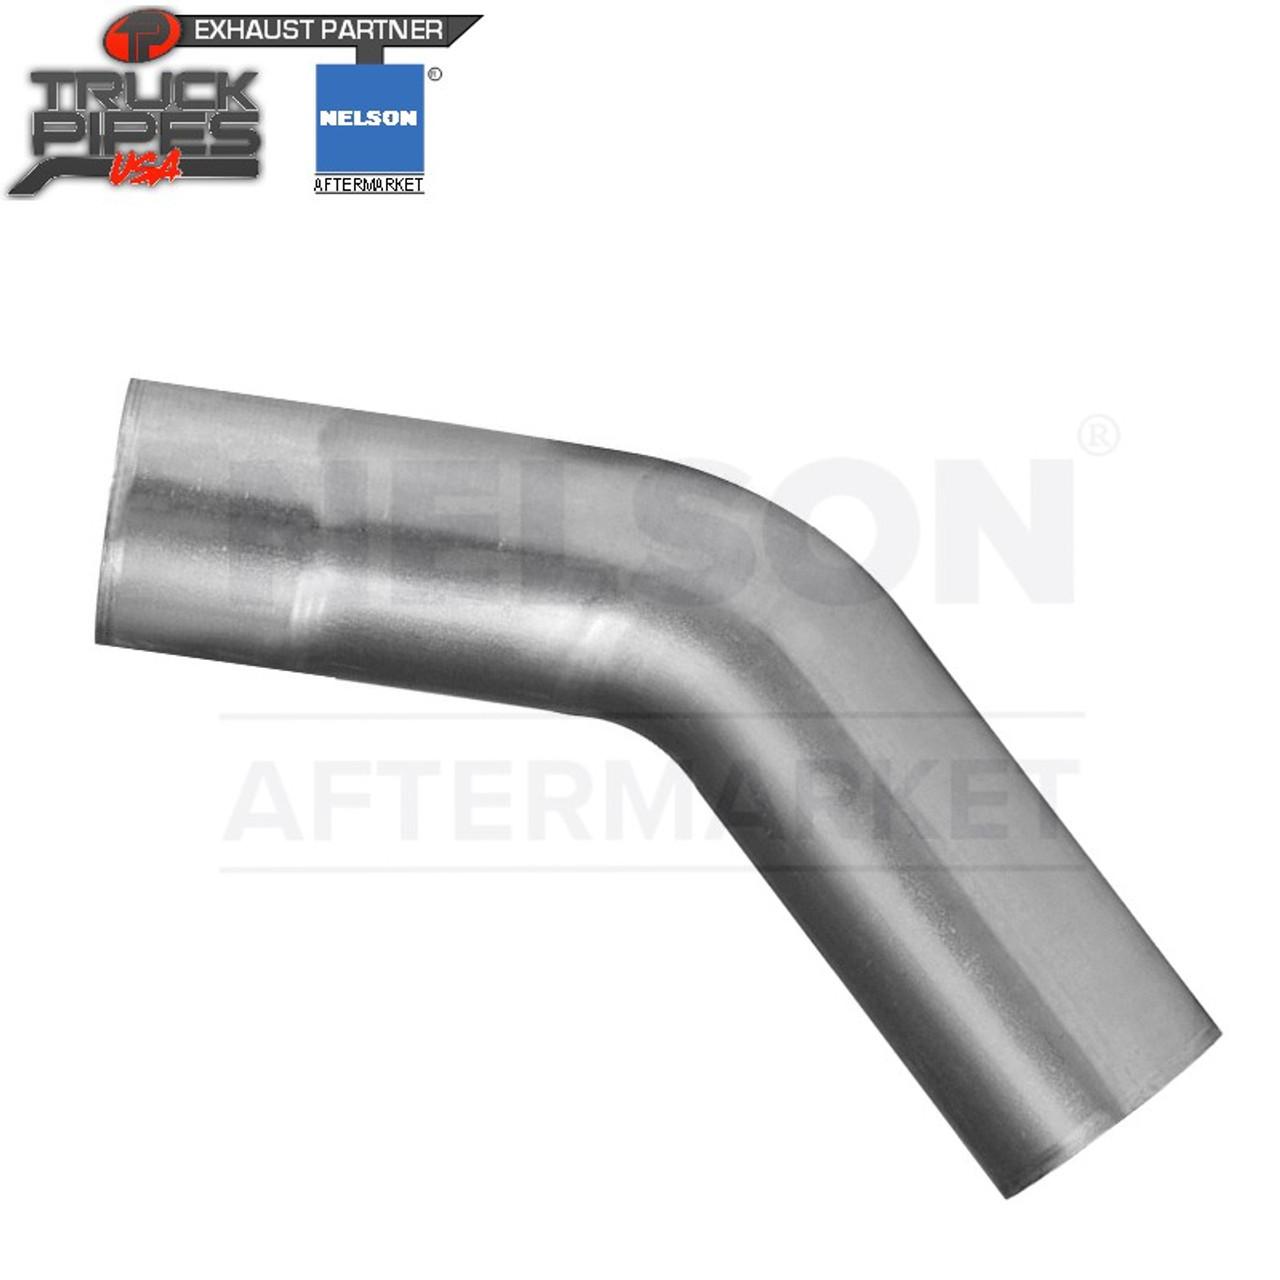 "4.5"" OD-OD 45 Degree Exhaust Elbow Aluminized x 10"" Leg Length Nelson 900100A"